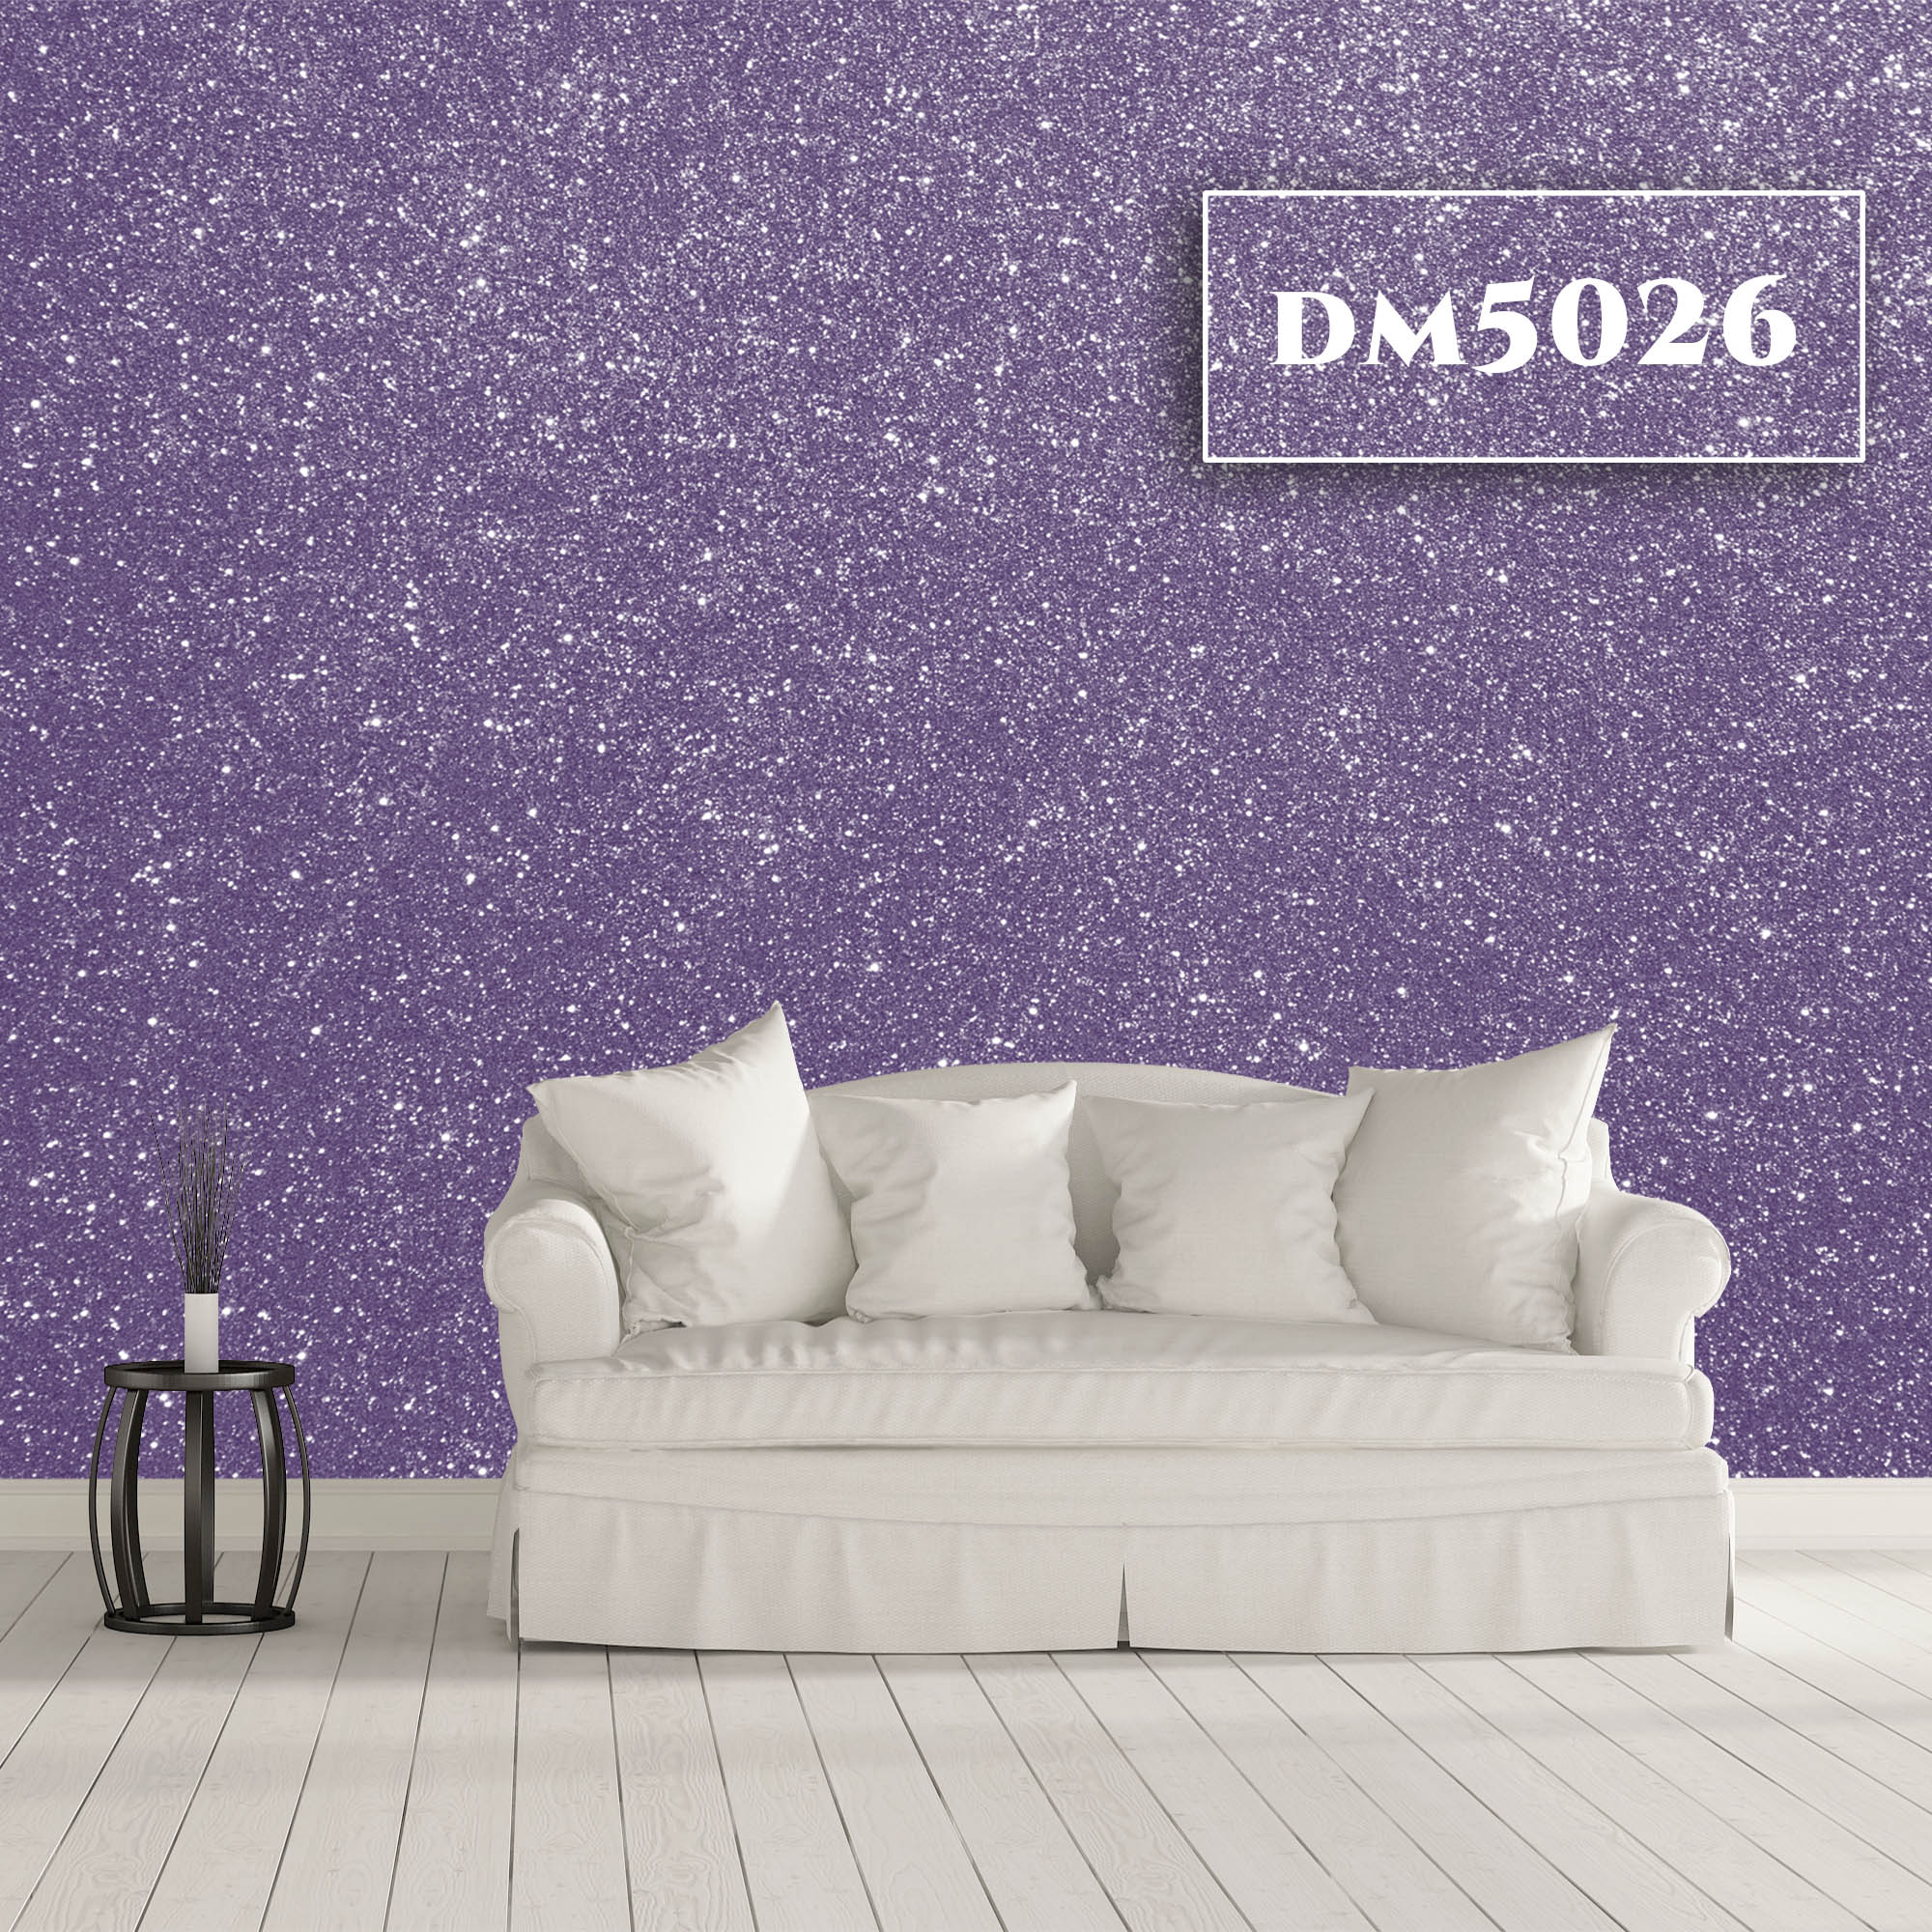 DM5026